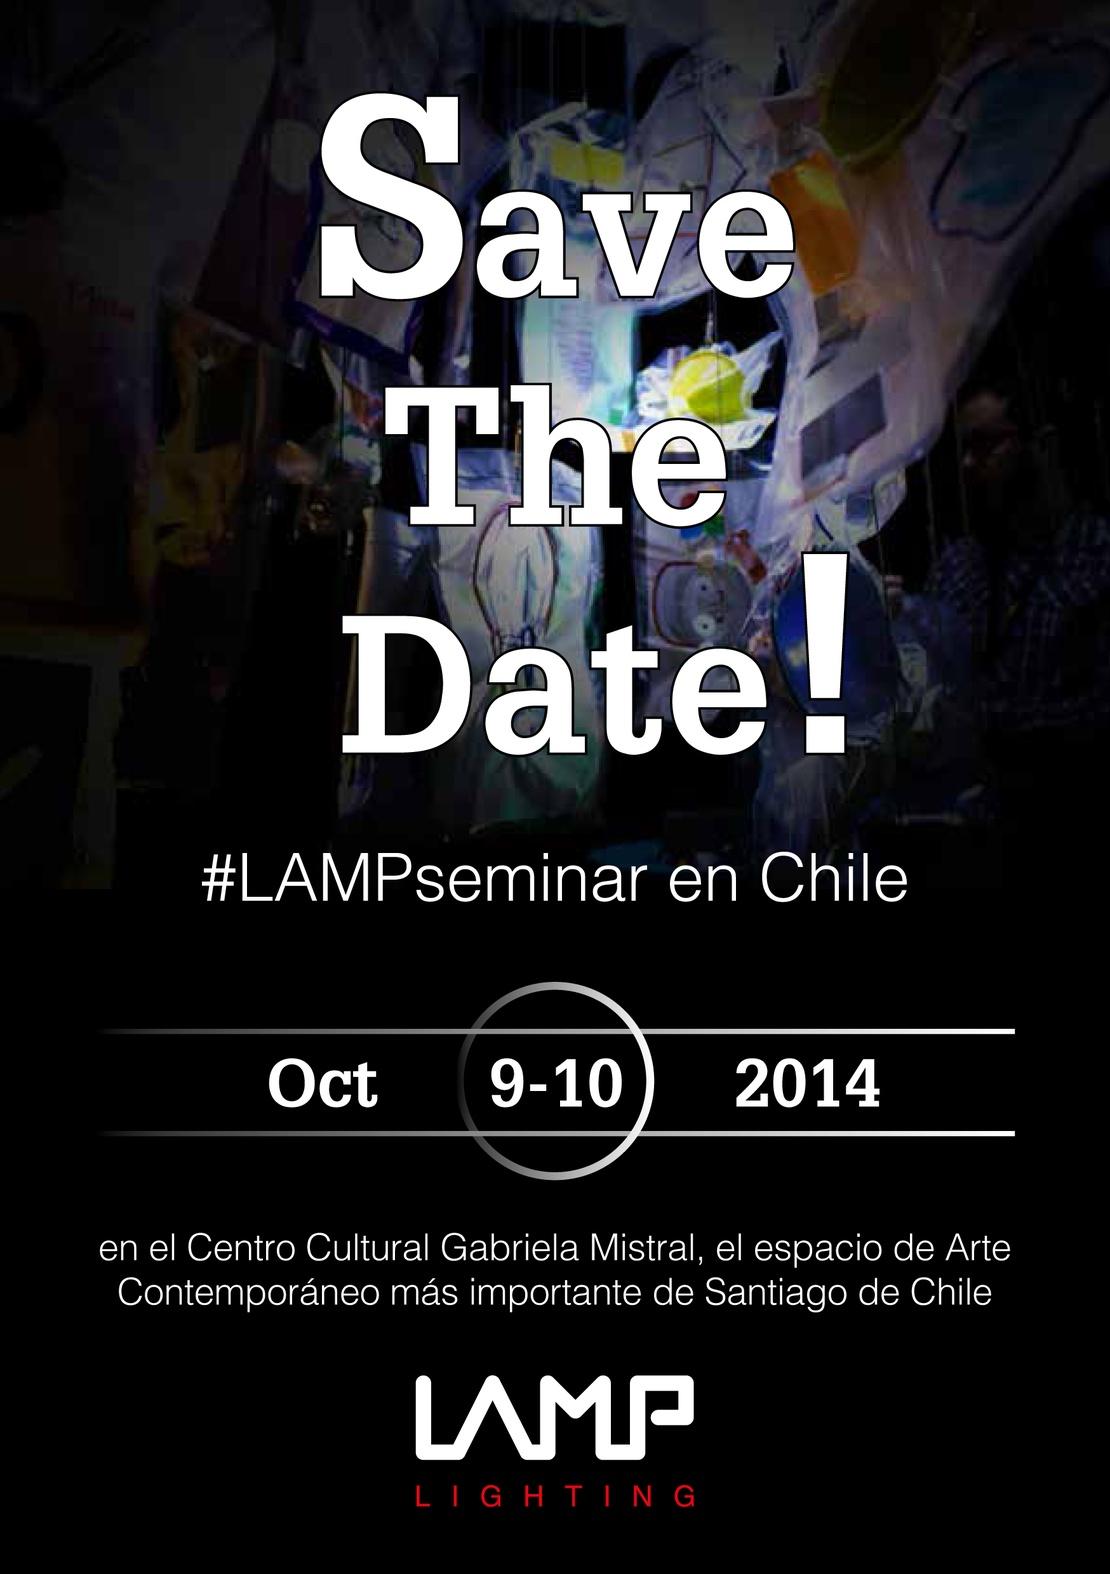 STD! #LAMPseminar en Chile 2